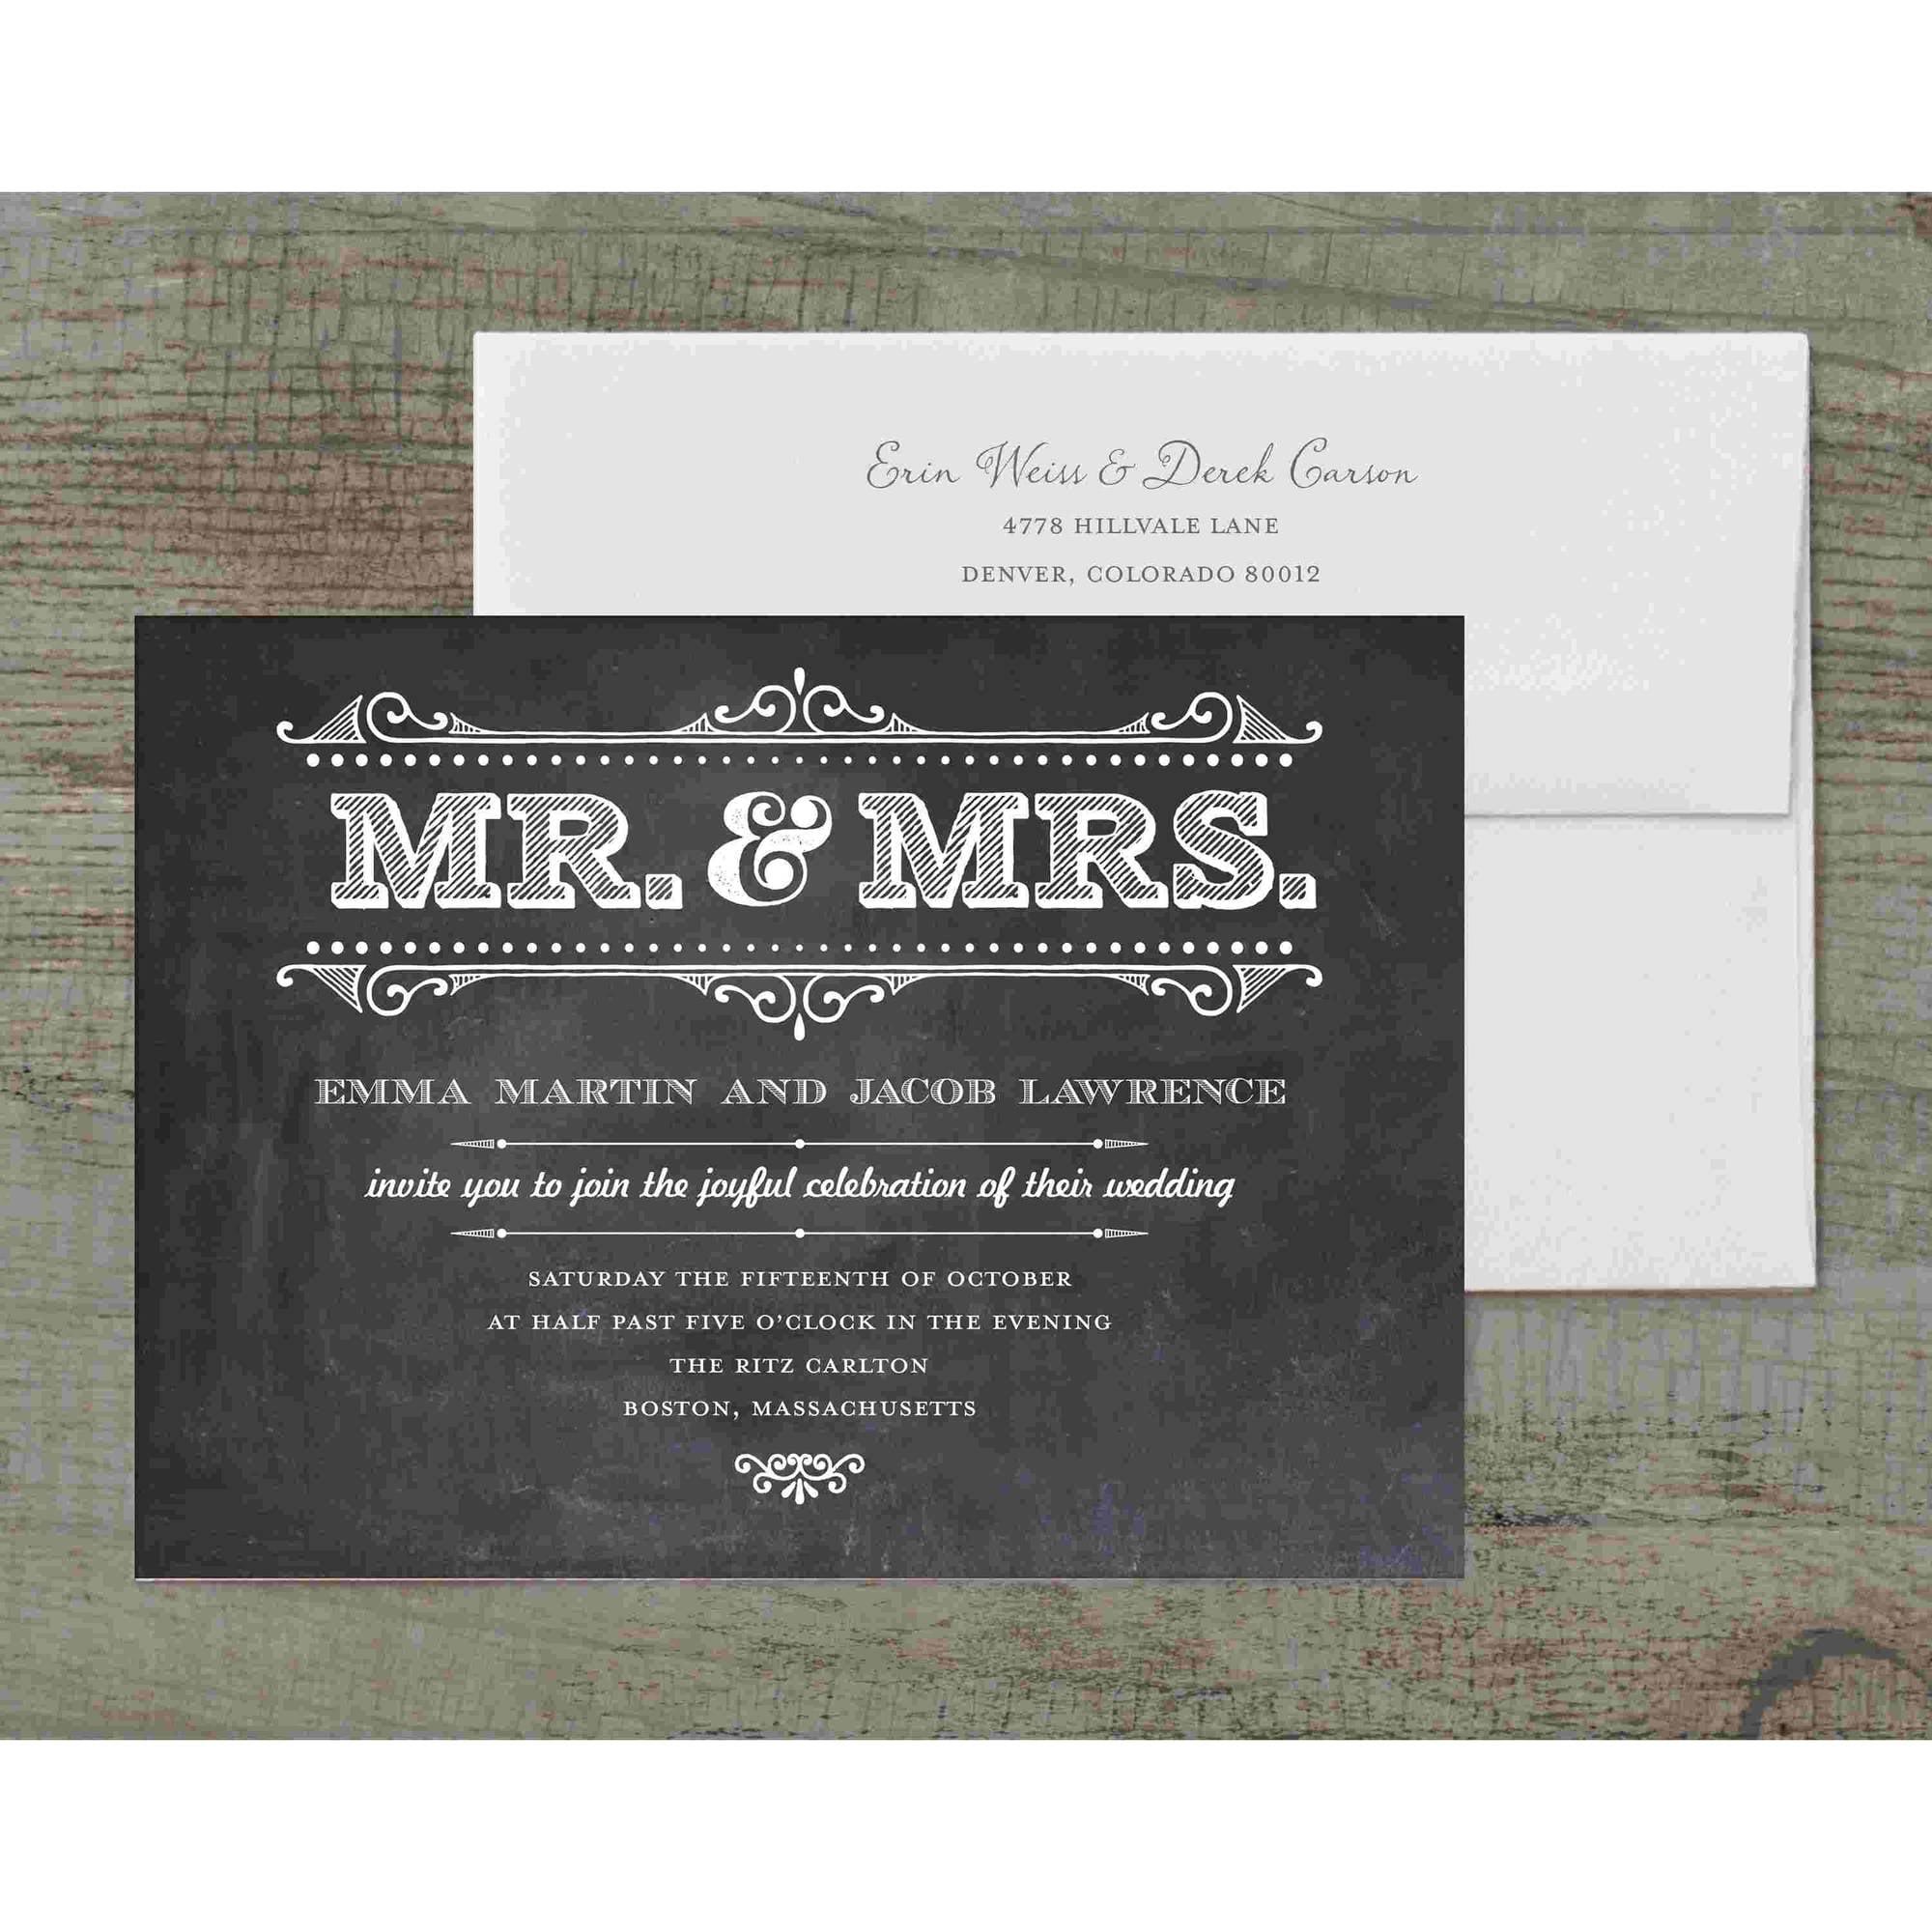 Mr and Mrs Rustic Deluxe Wedding Invitation - Walmart.com